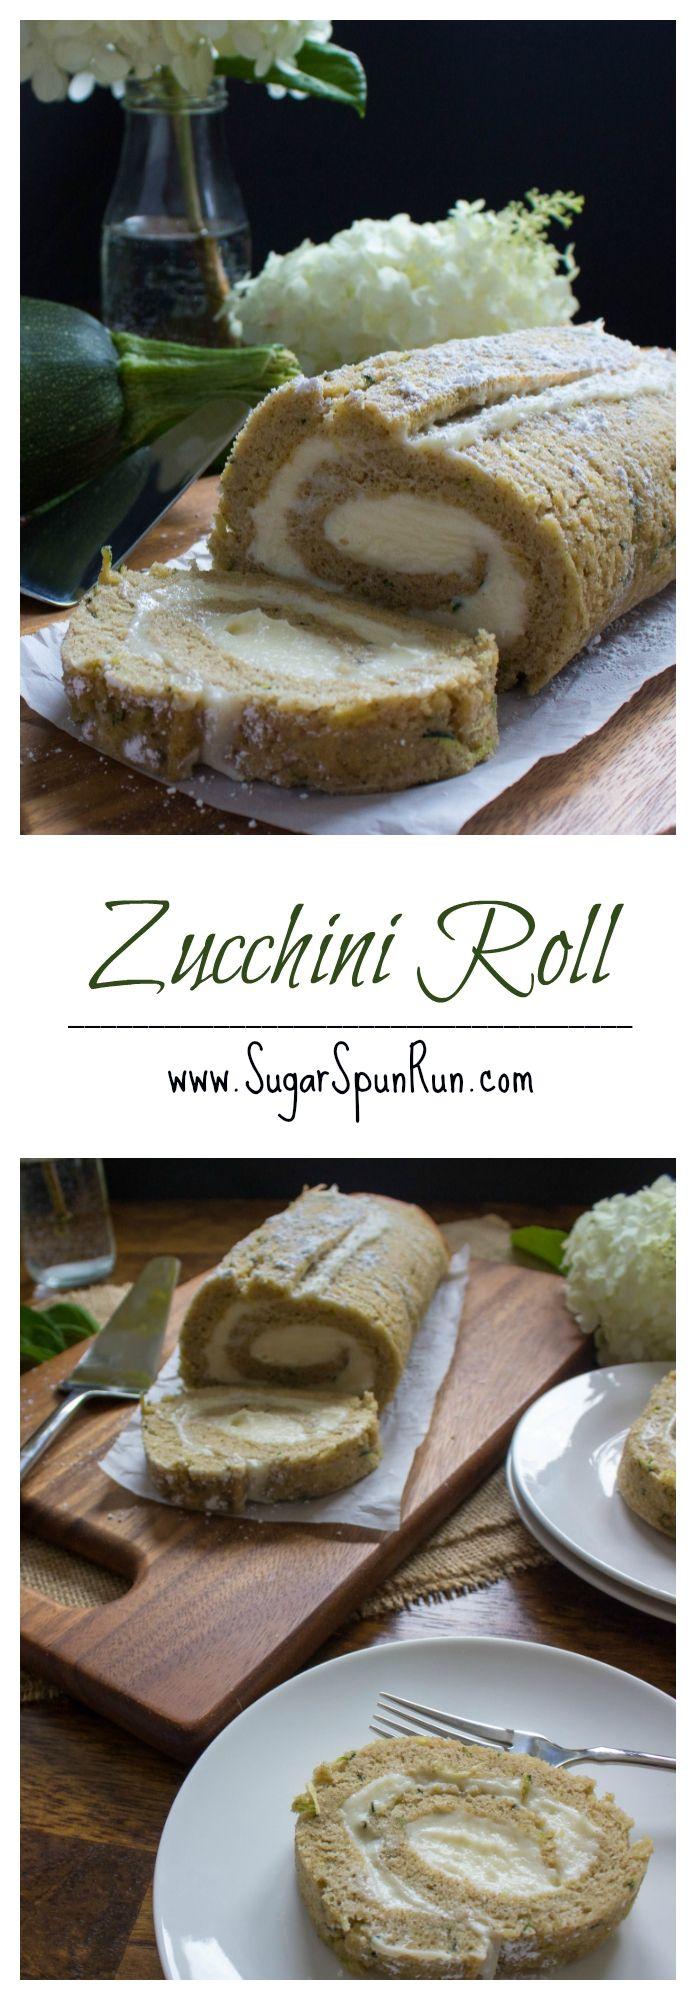 nike air jordan uk size 5 Zucchini Roll  fun  easy way to use up zucchini    from SugarSpunRun